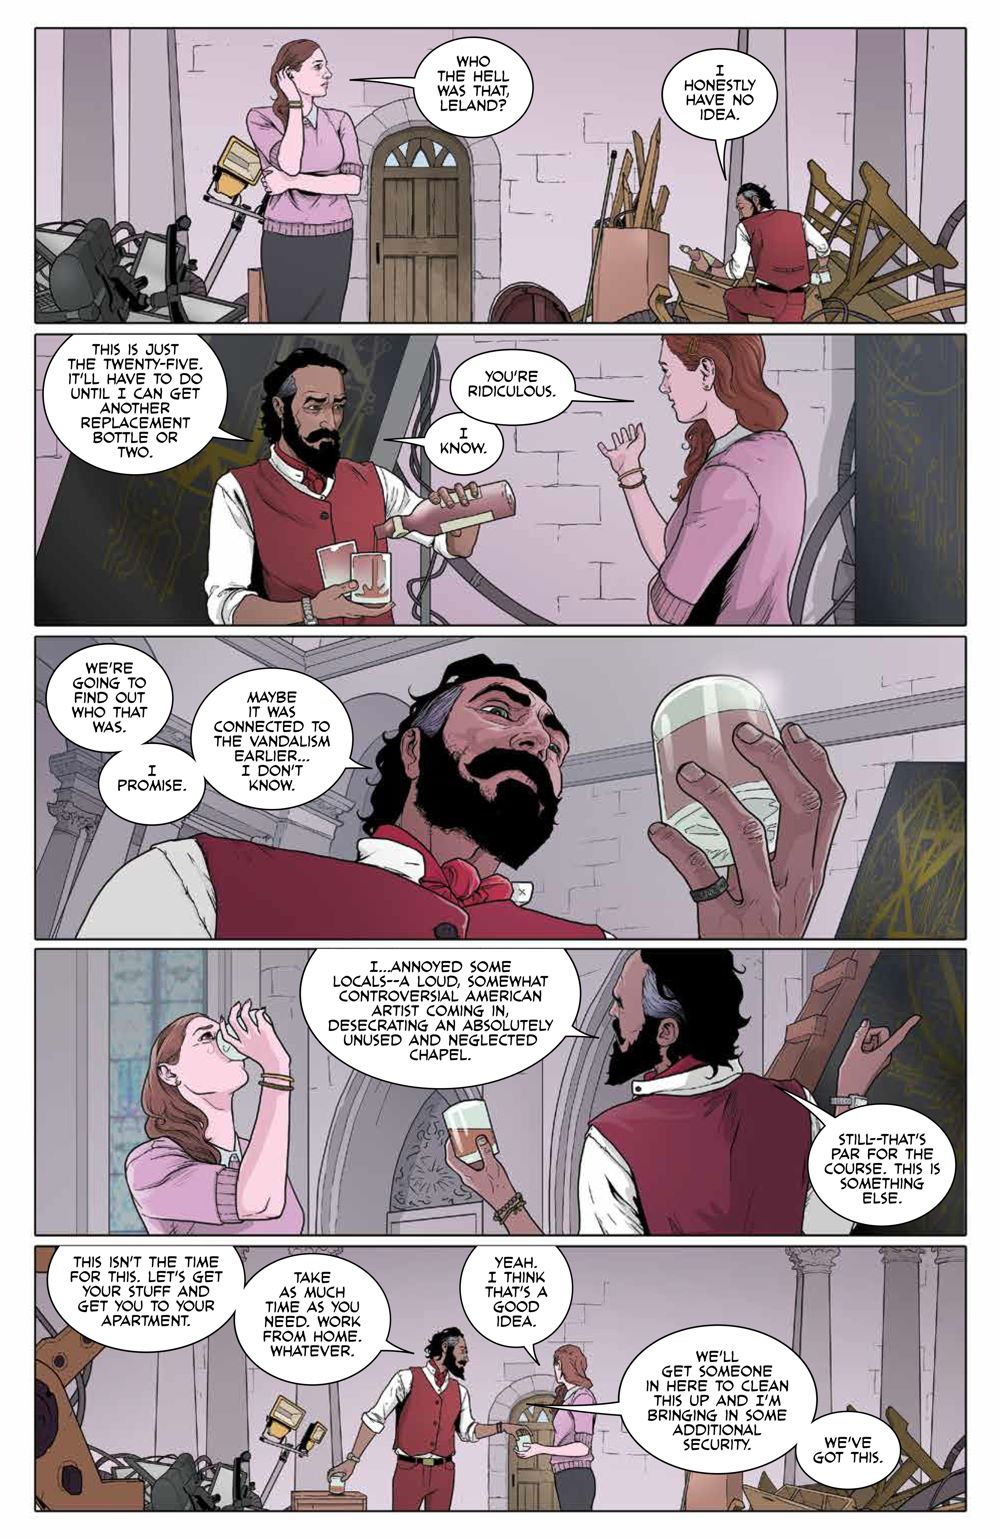 RedMother_v3_SC_PRESS_19 ComicList Previews: RED MOTHER VOLUME 3 TP